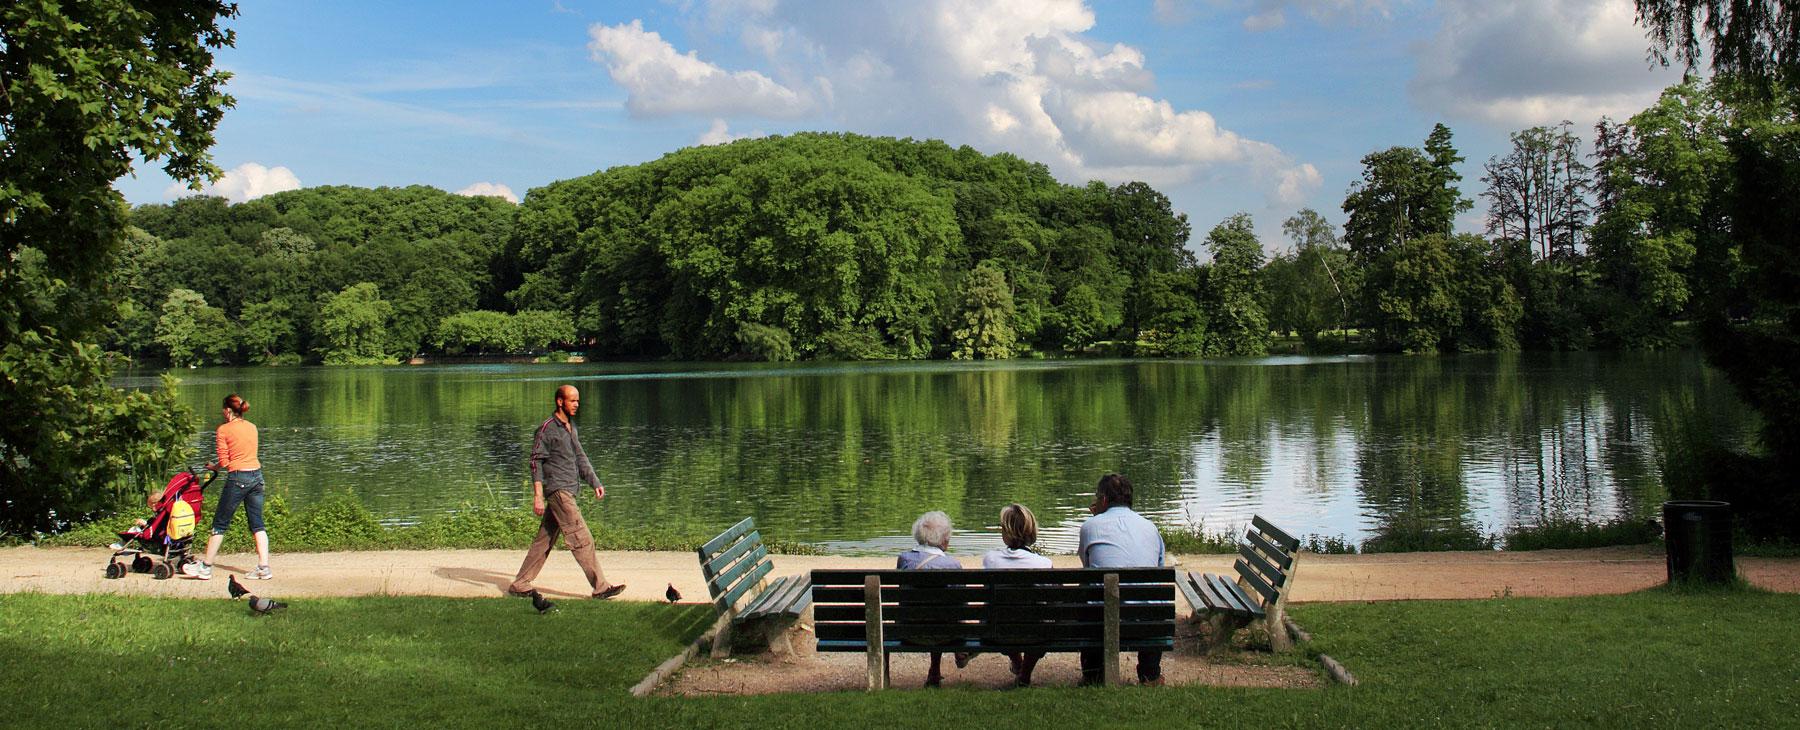 5 parcs et jardins o 28 images parcs et jardins for Jardin youtube